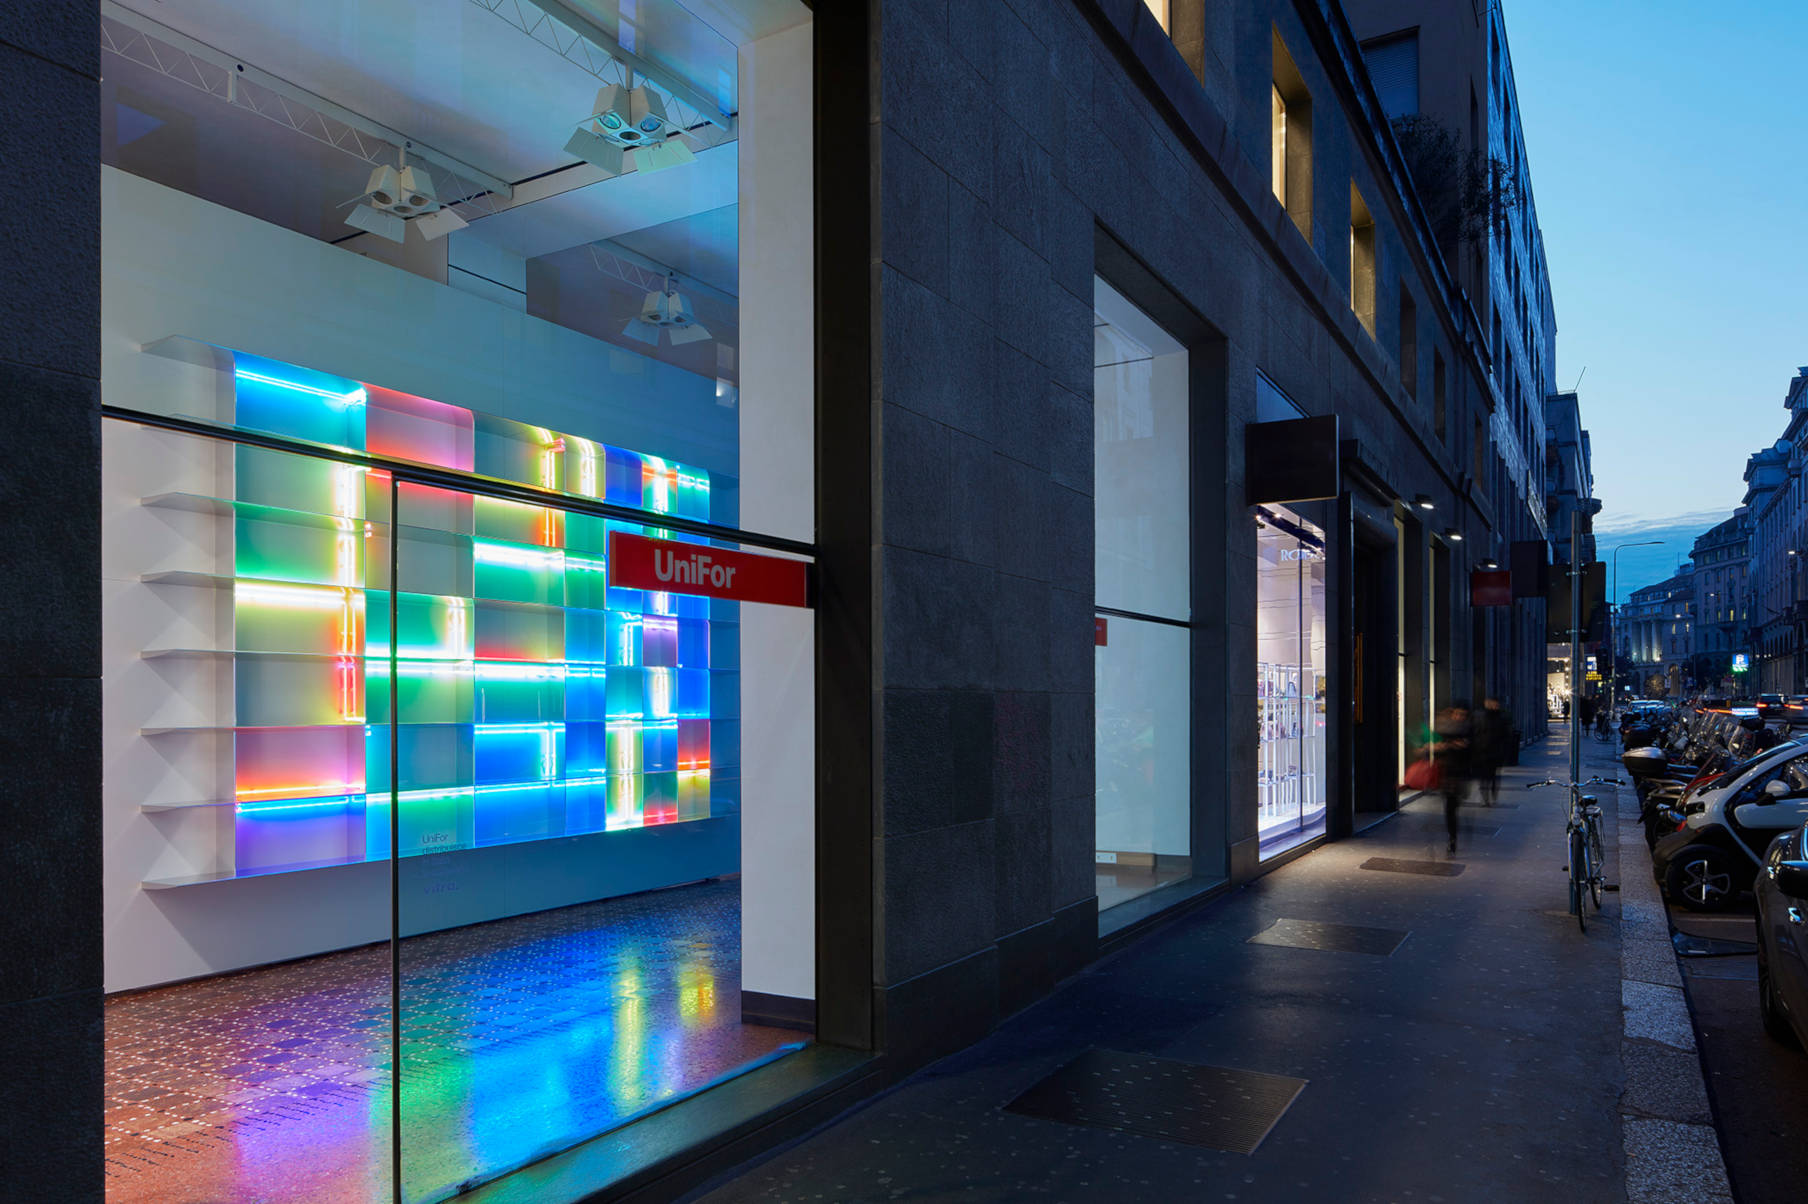 Showroom UniFor a Milano